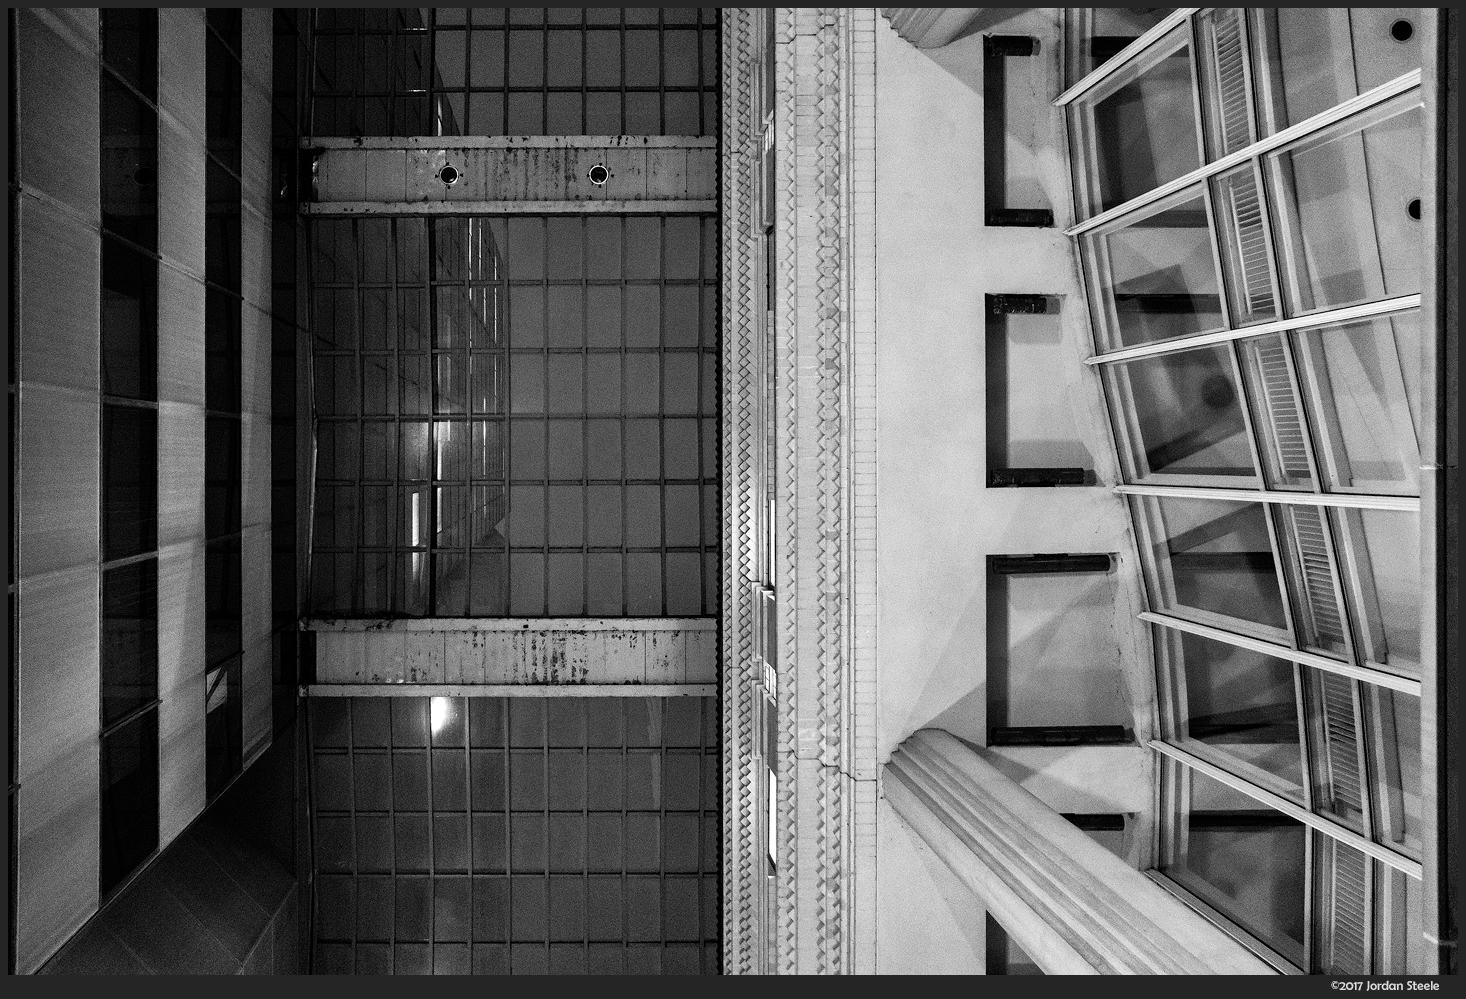 Atrium Roof - Fujifilm X-T2 with Fujinon XF 23mm f/2 R WR @ f/2